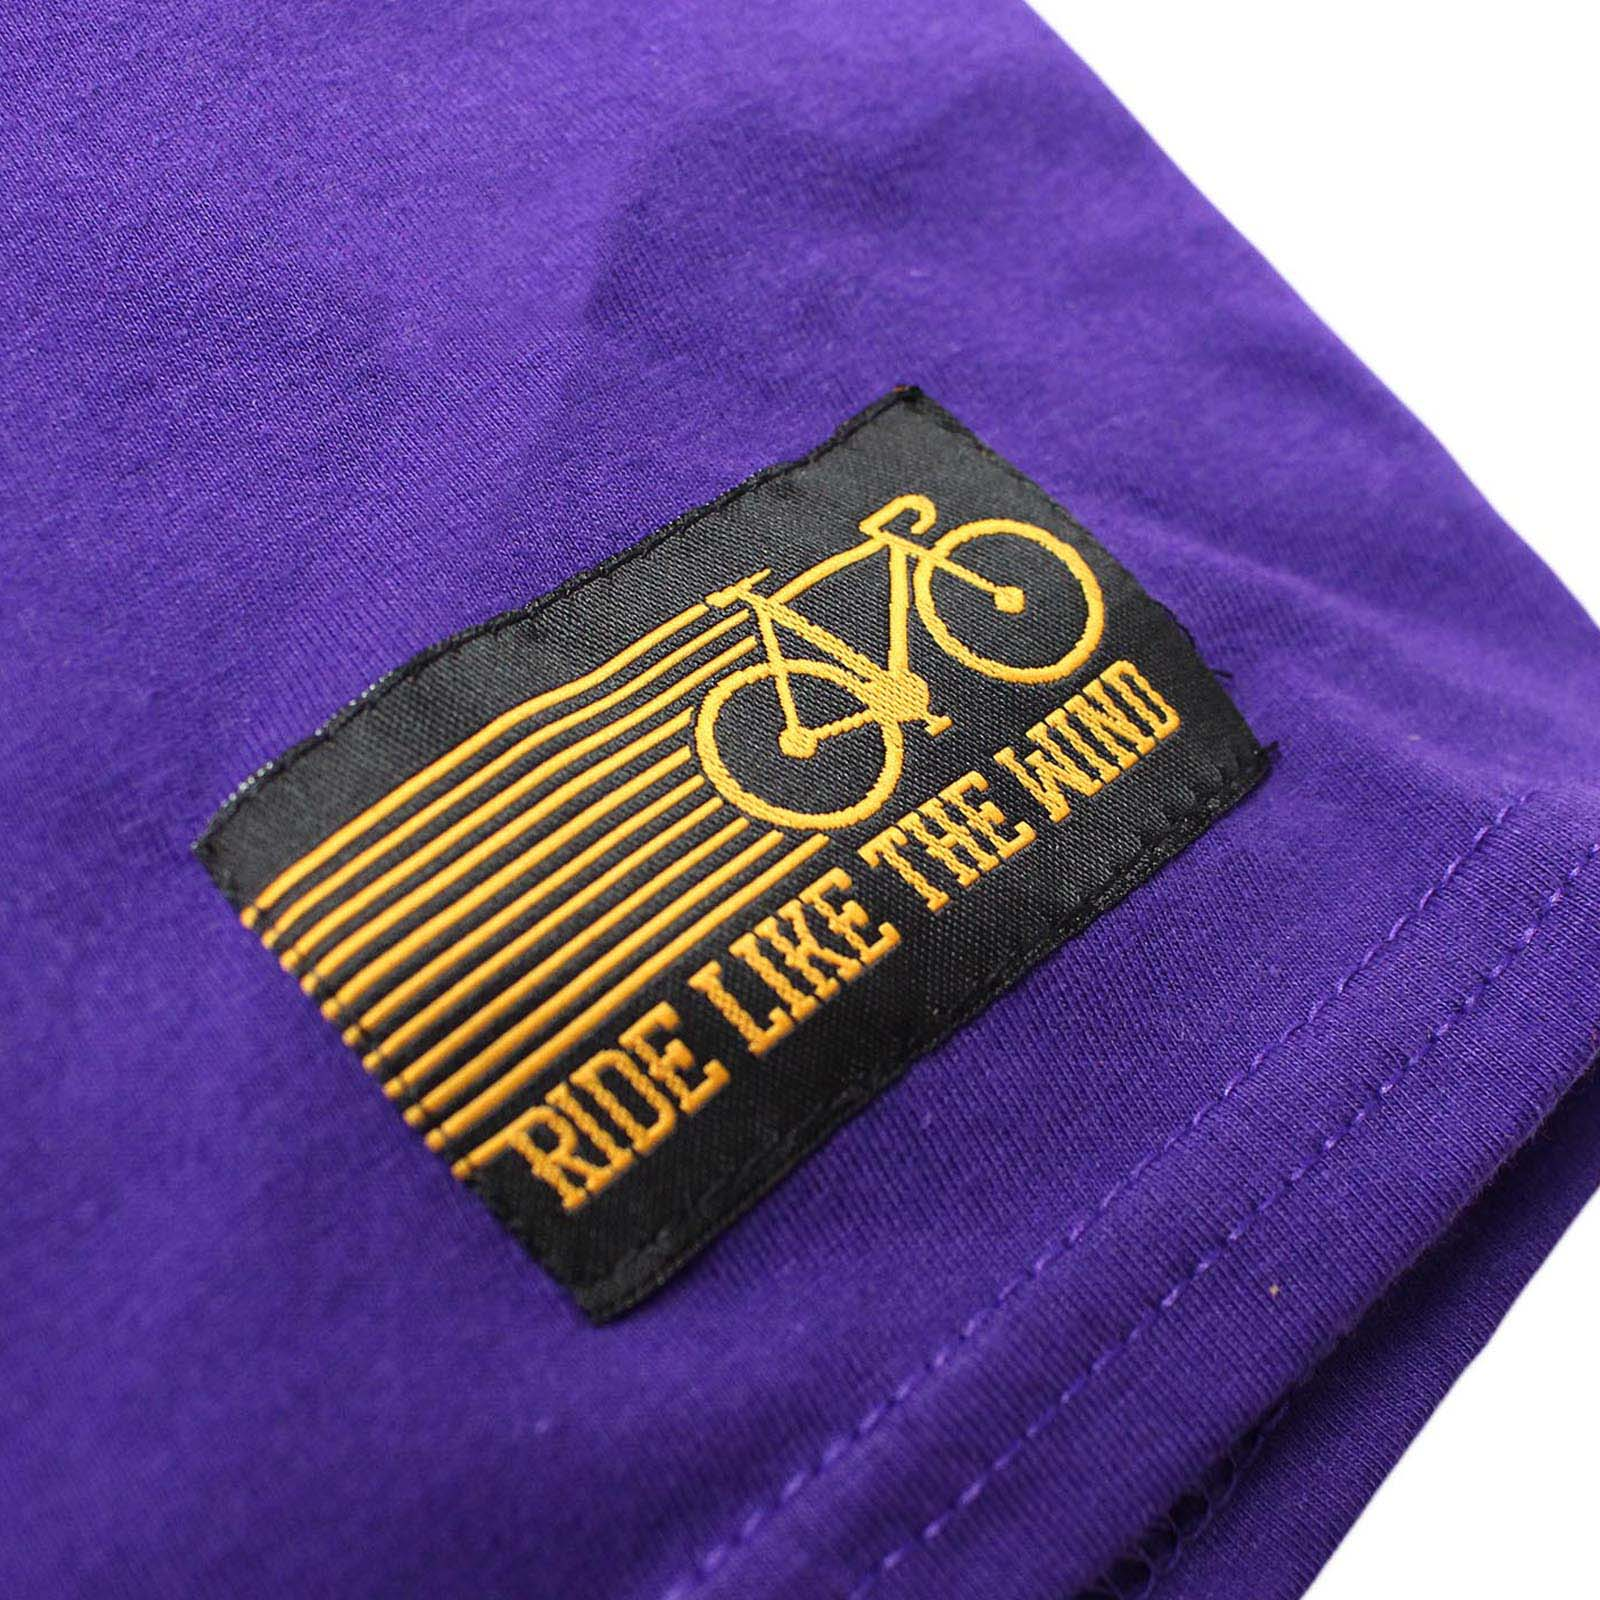 Cycling-Yeah-My-Bike-Did-Cost-More-funny-top-Birthday-tee-T-SHIRT-T-SHIRT thumbnail 25